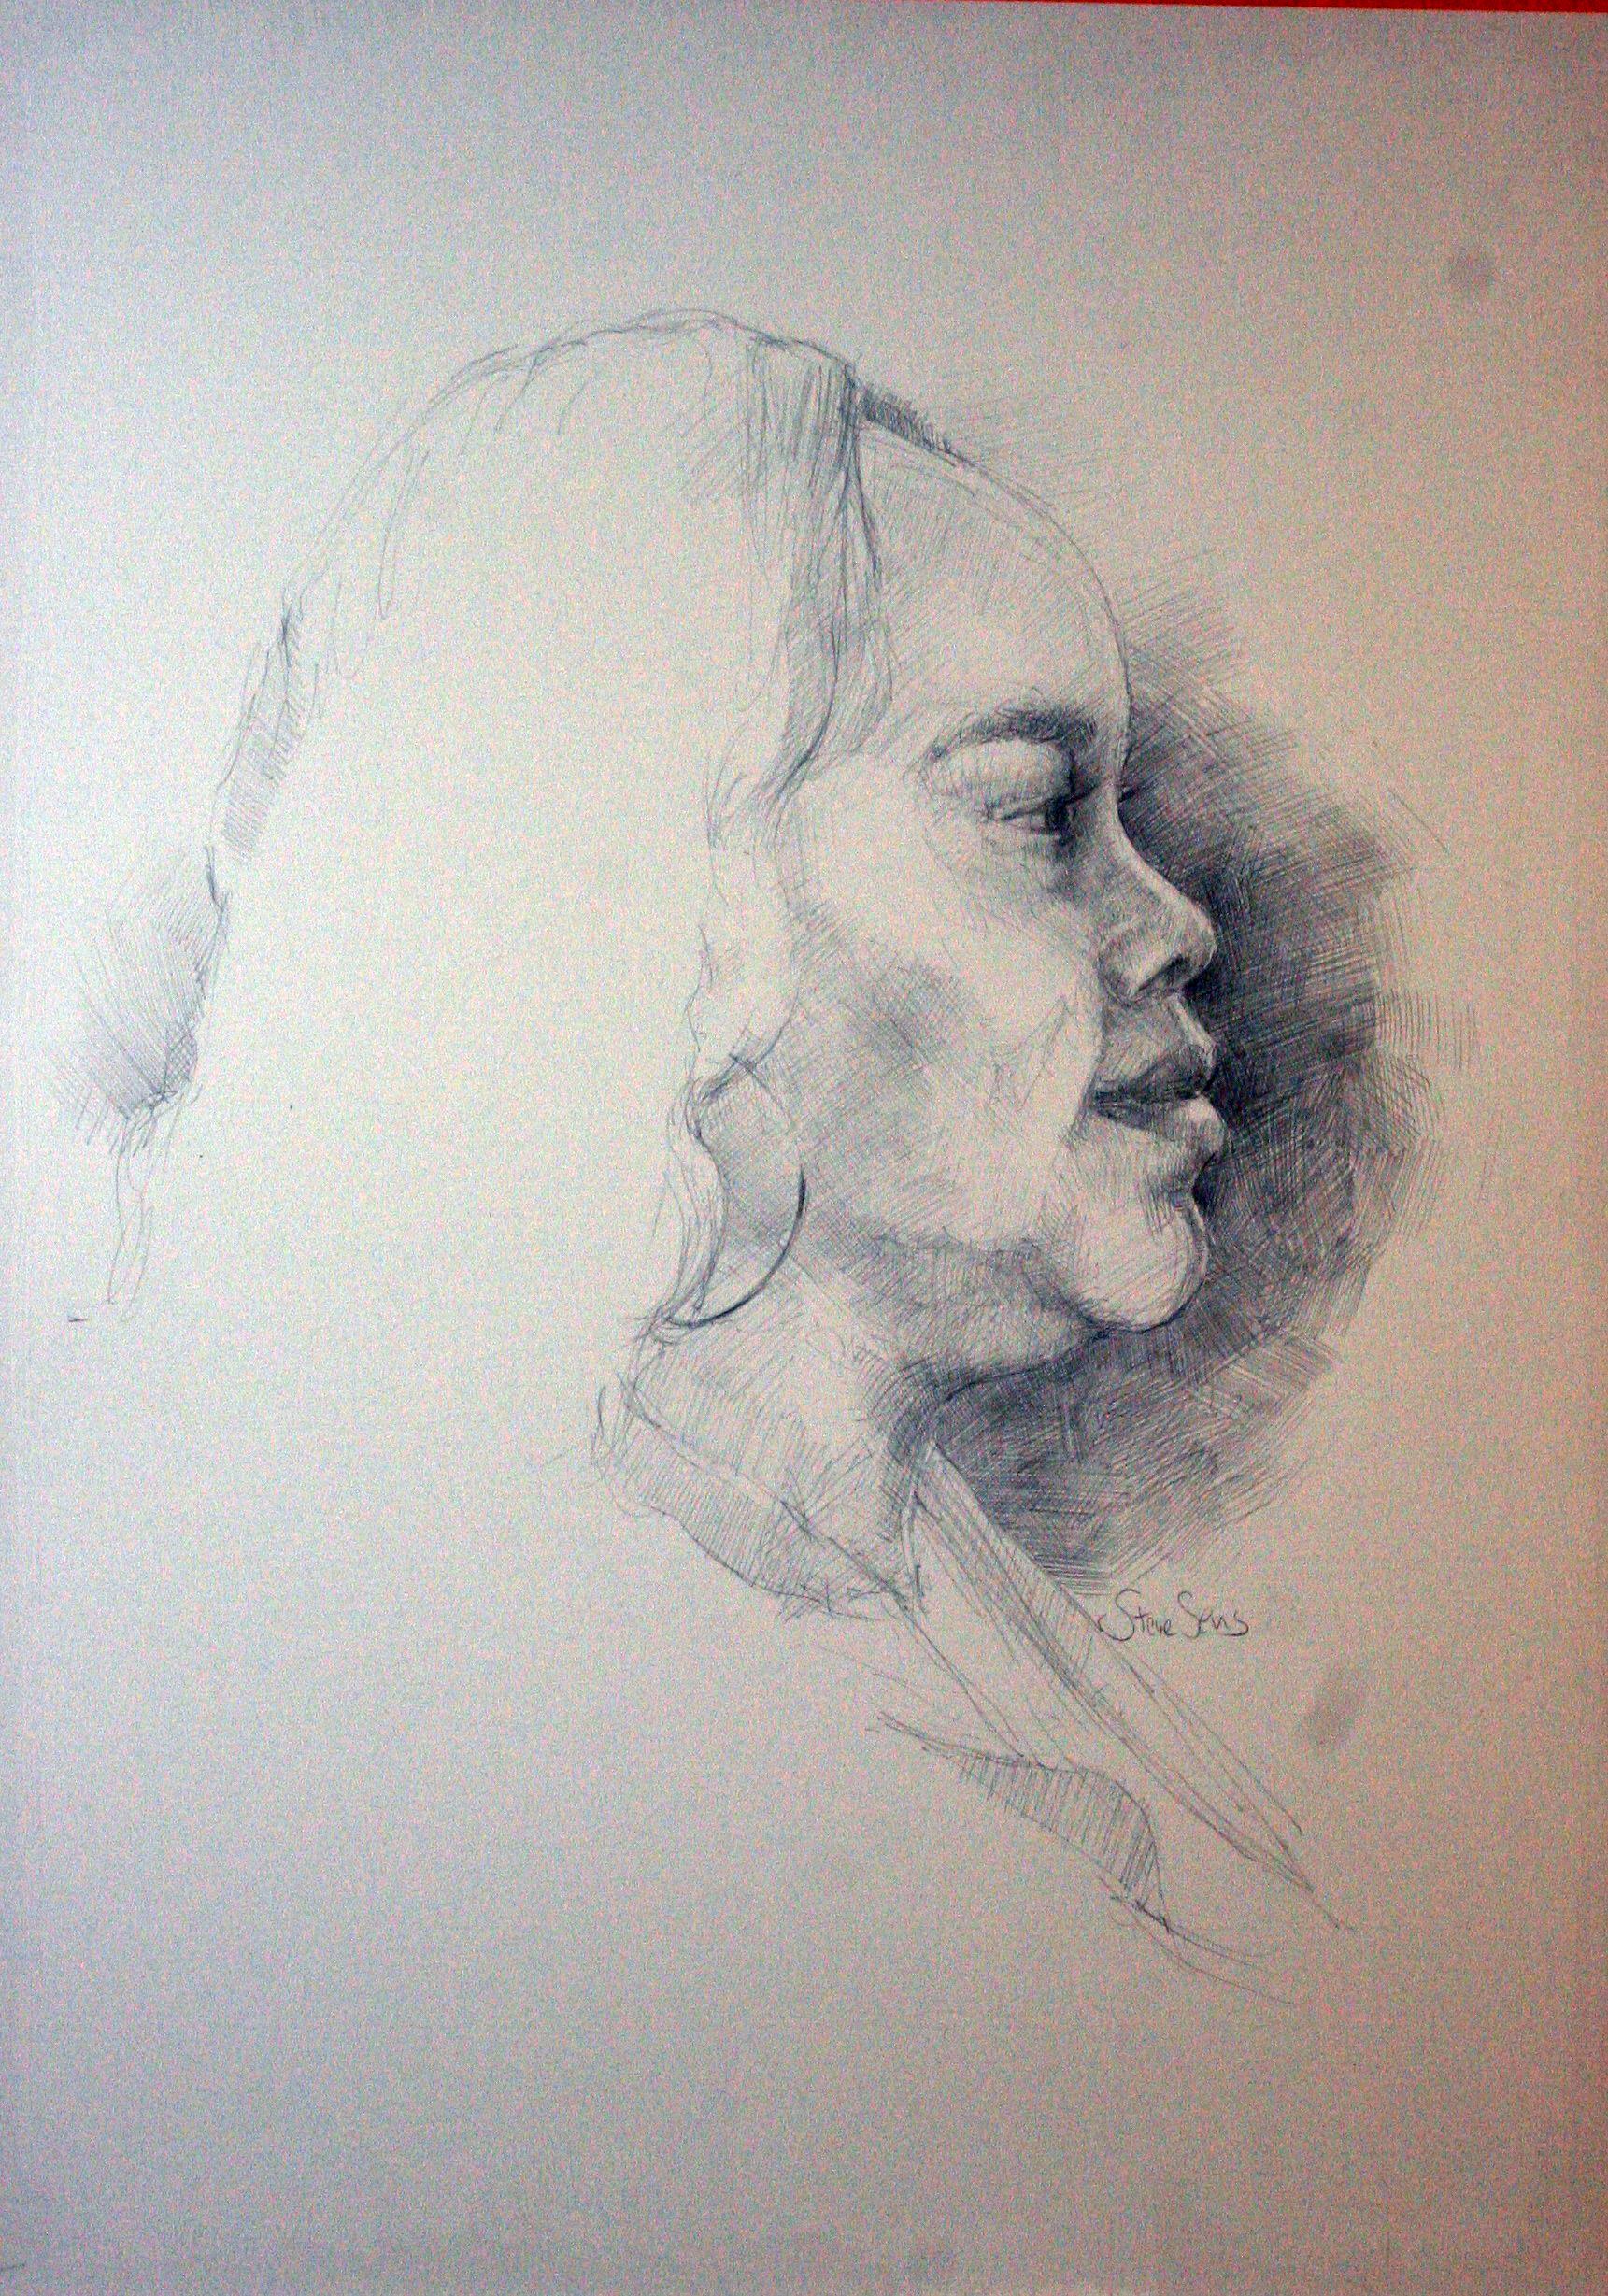 Steve Sens did this profile drawing.